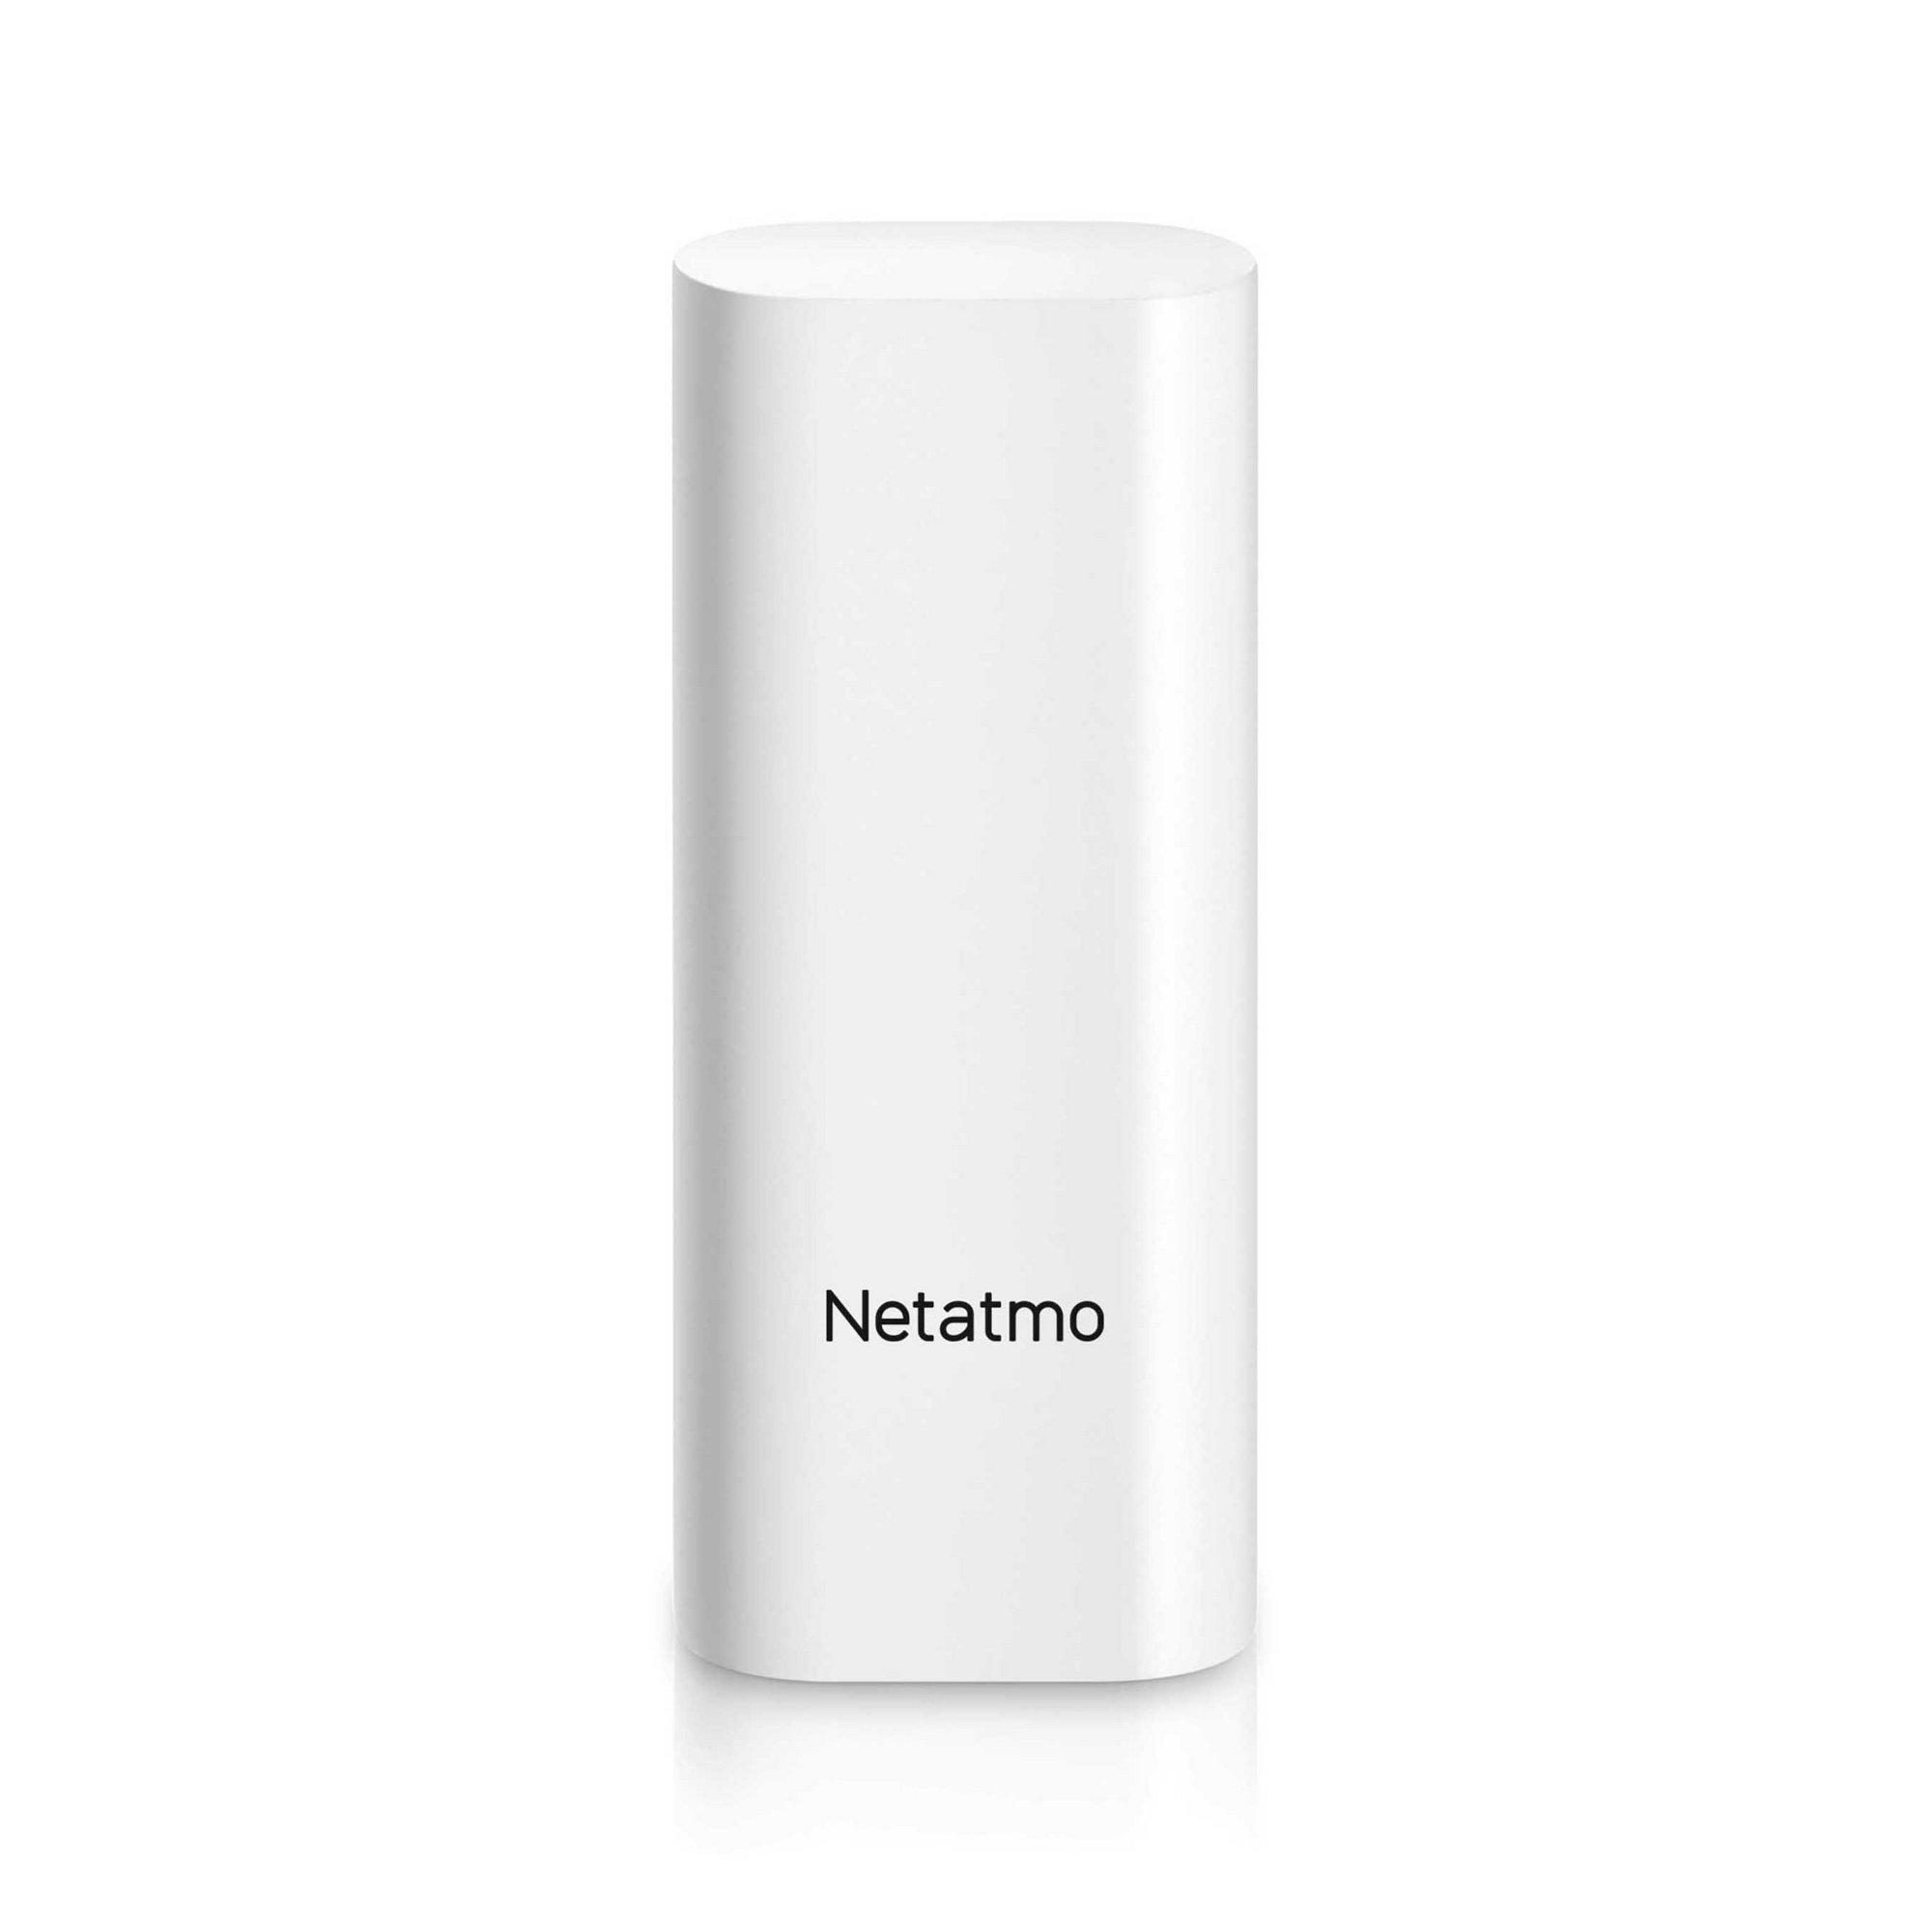 Image of Netatmo Smart Door and Window Sensors